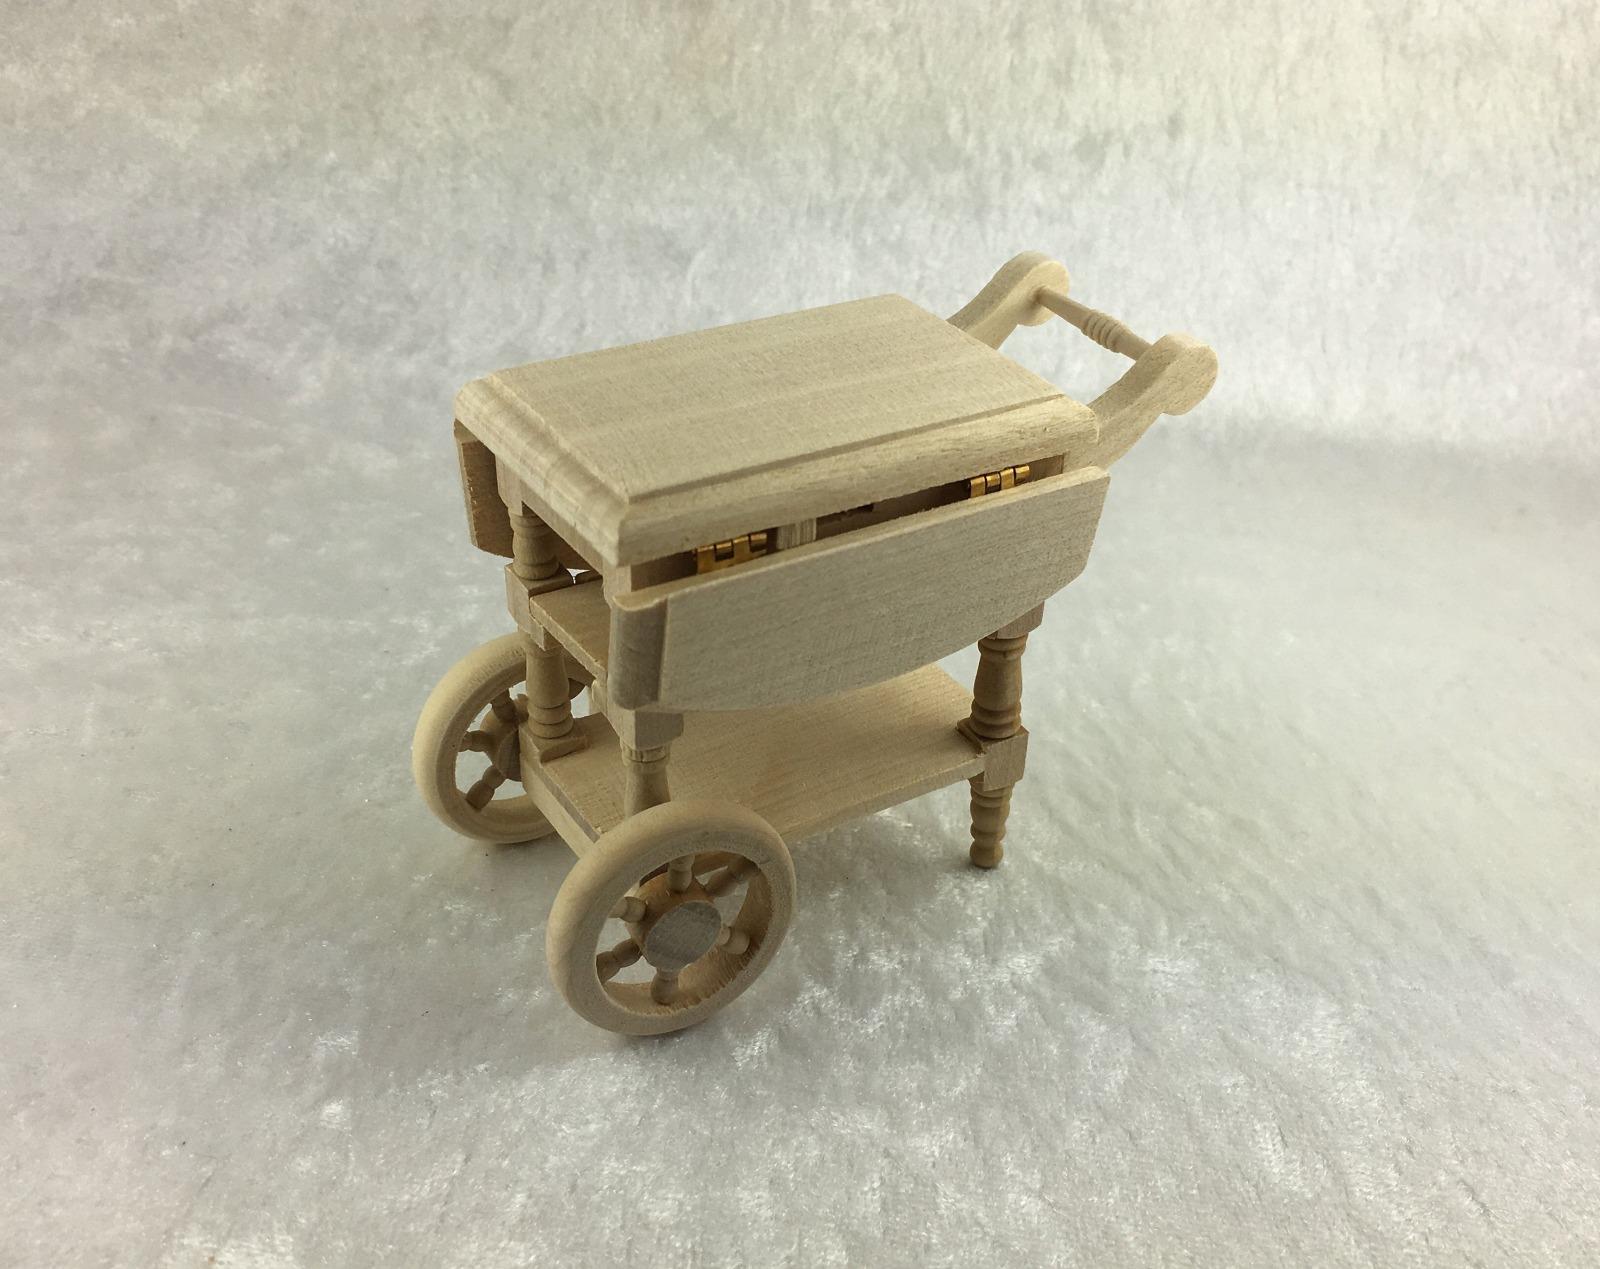 Teewagen 1:12 Miniatur